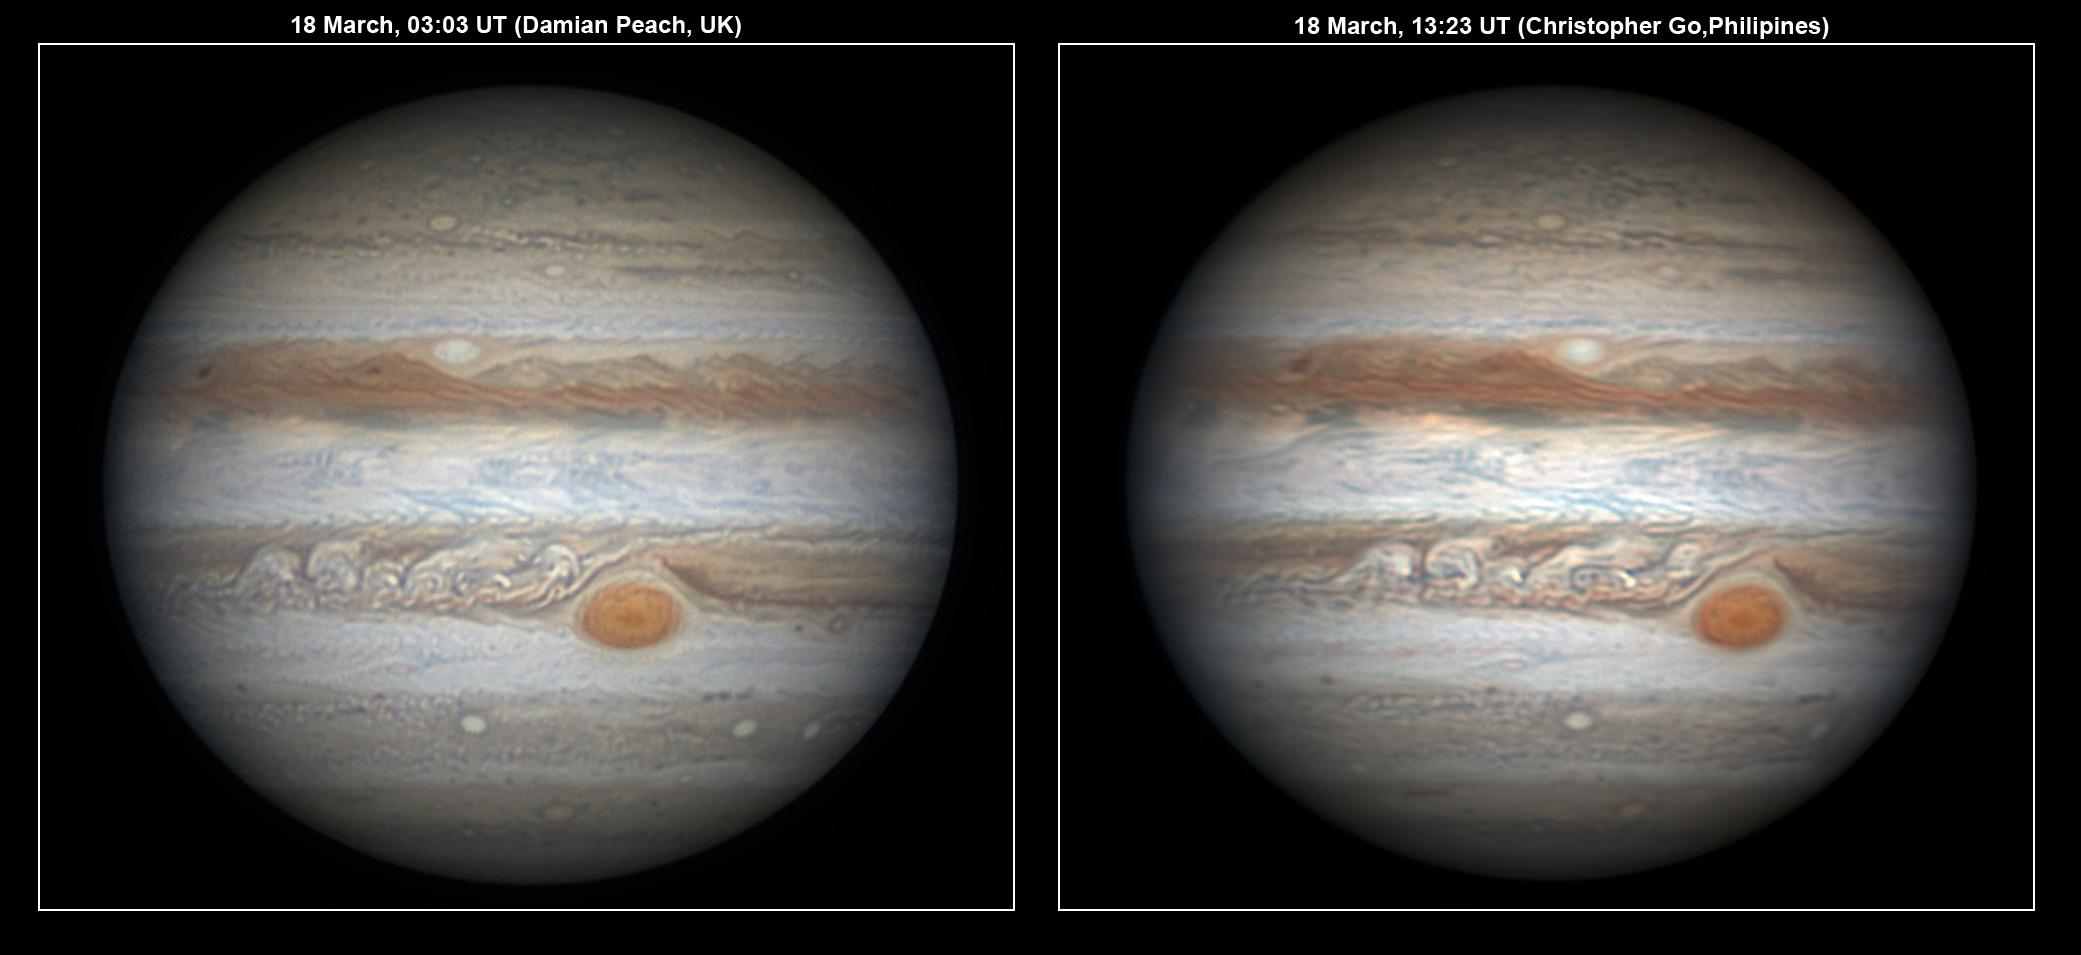 jupiter planet map hi res - photo #35